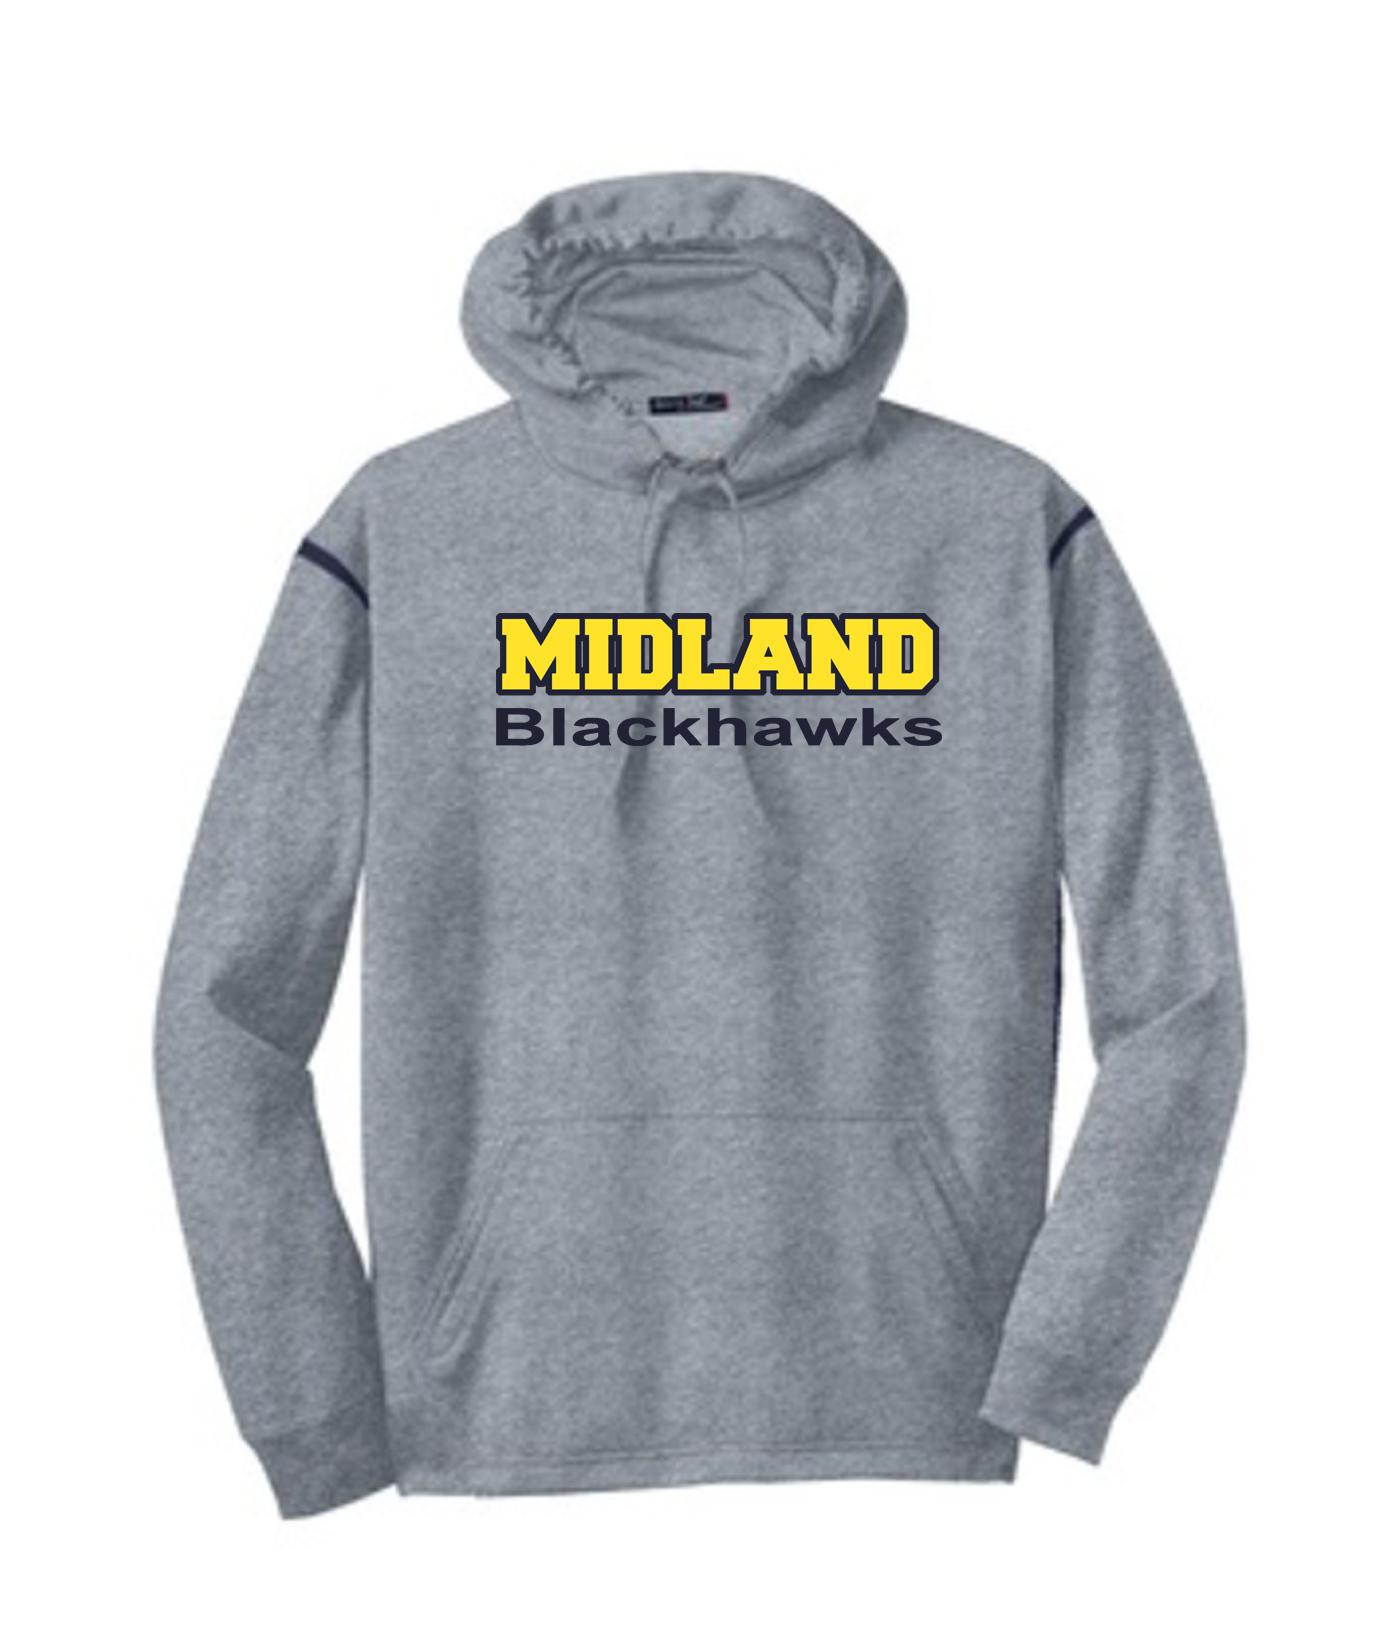 Sport-Tek Grey Tech Fleece Colorblock Hooded Sweatshirt Color Midland Blackhawks Navy Out Gold In